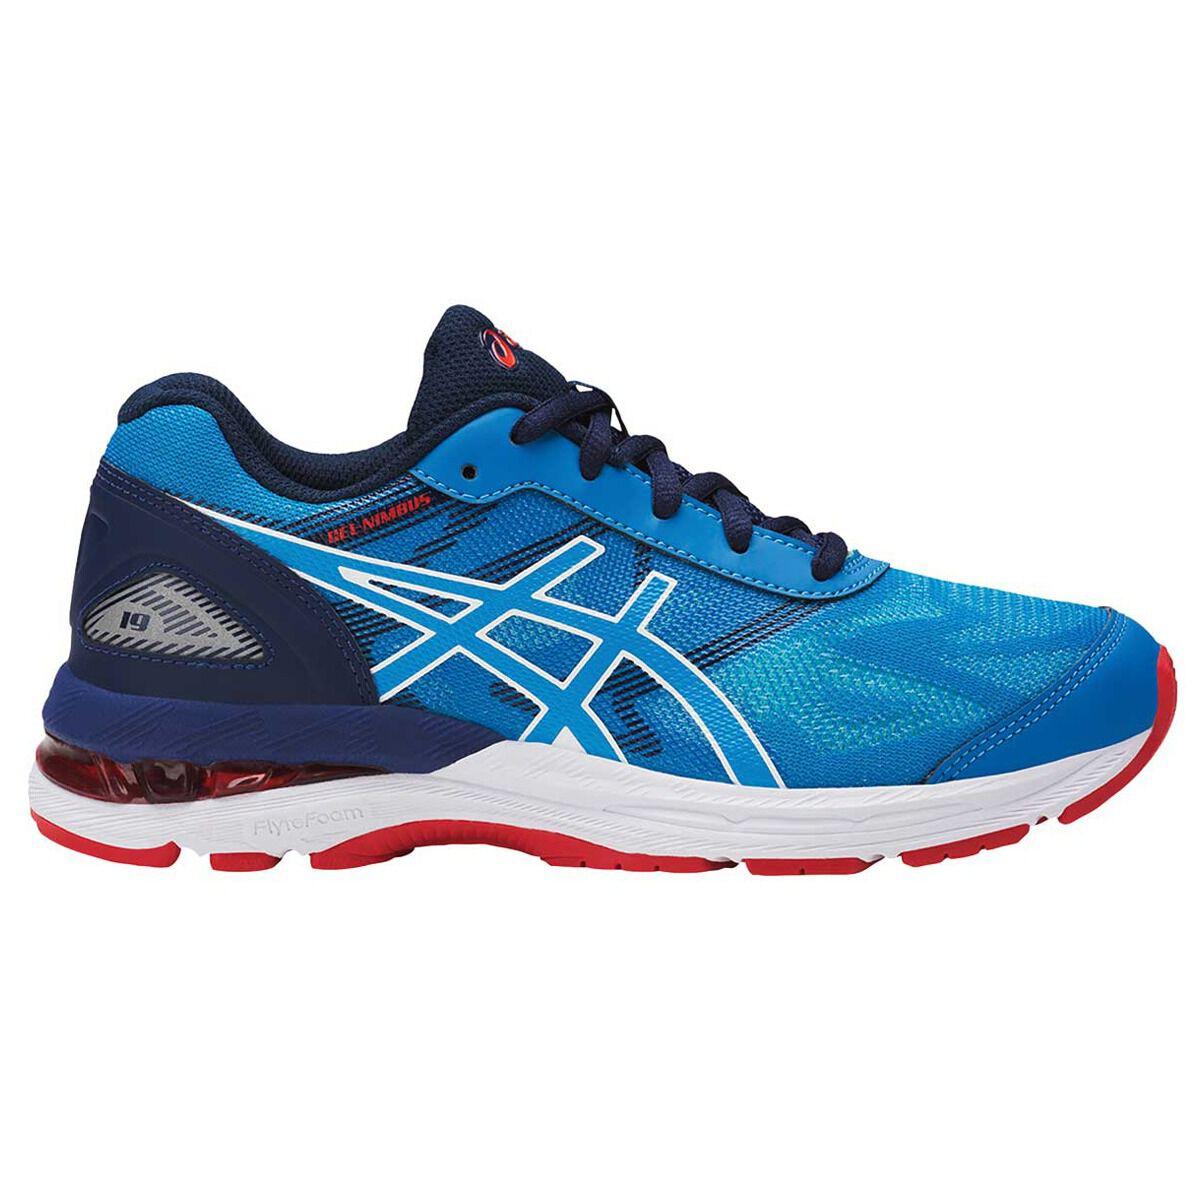 Sport Us 19 Running Nimbus Boys Shoes Blue Asics 3Rebel White VMGUSzqp